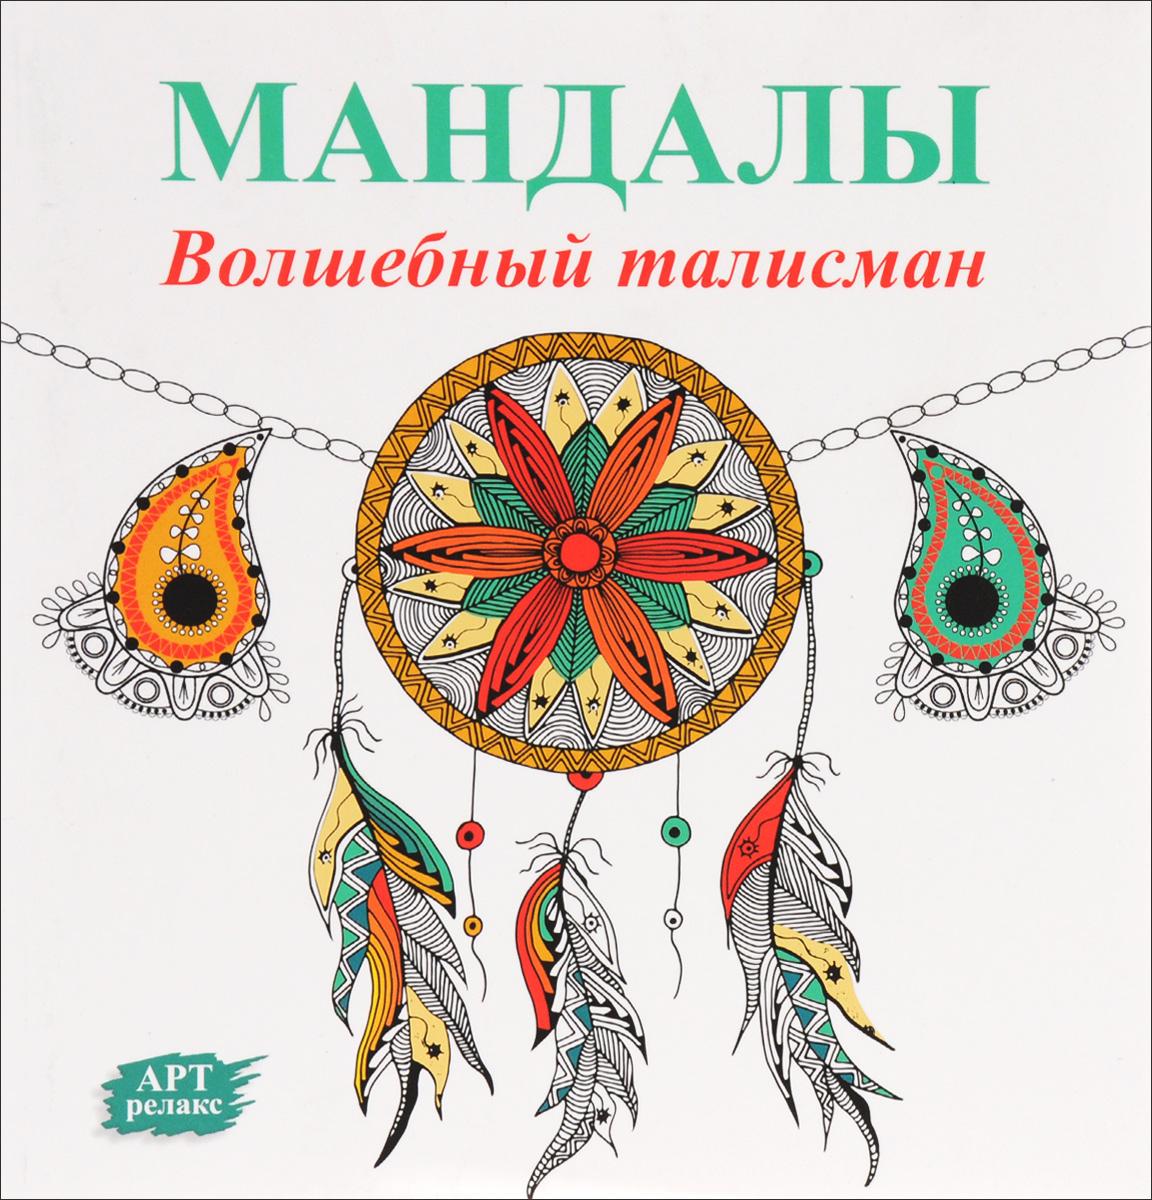 Ж. Богданова Мандалы. Волшебный талисман ламбен ж ж менеджмент ориентированный на рынок